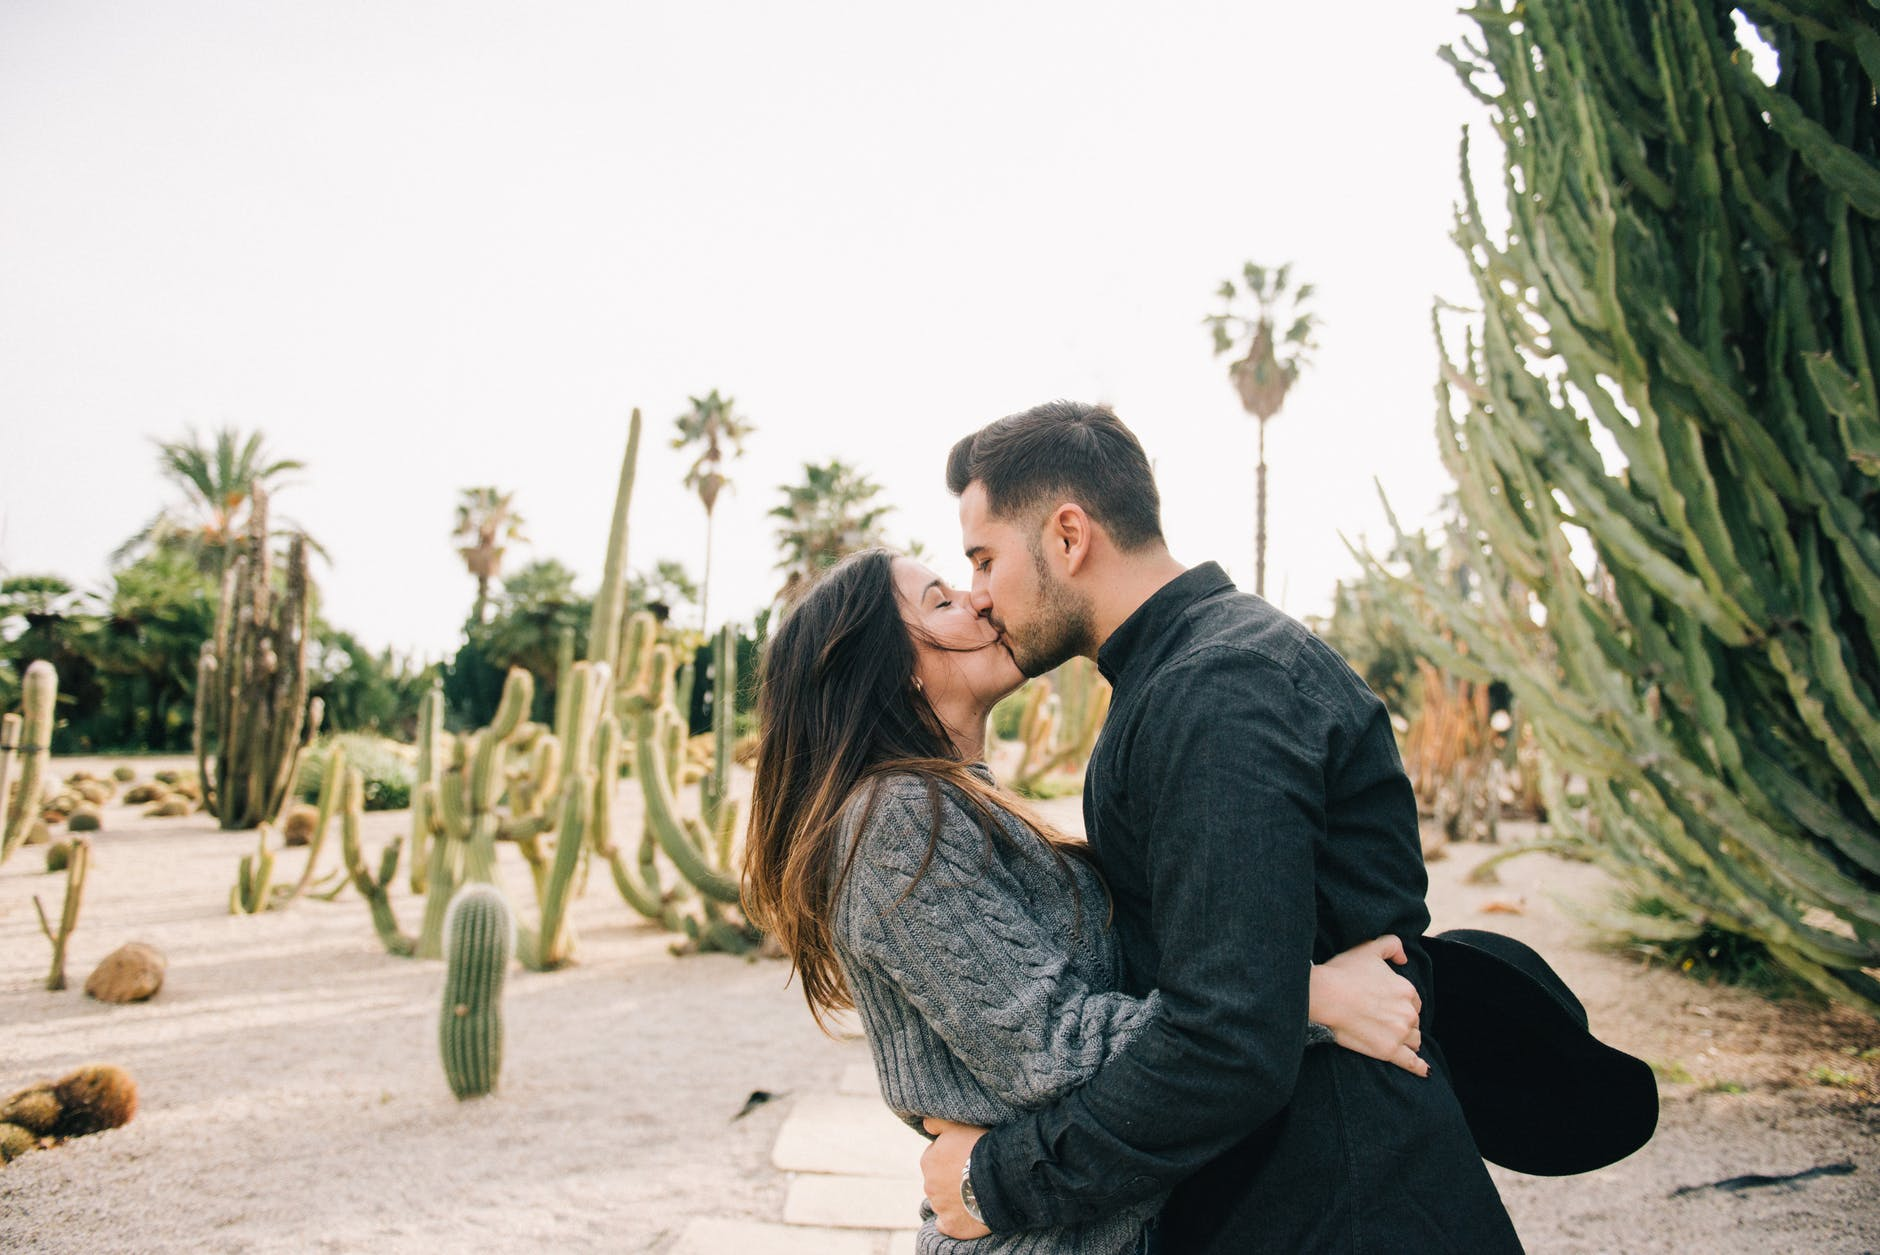 Ini Gaya Berciuman Tiap Zodiak dan Caranya Menunjukkan Kasih Sayang